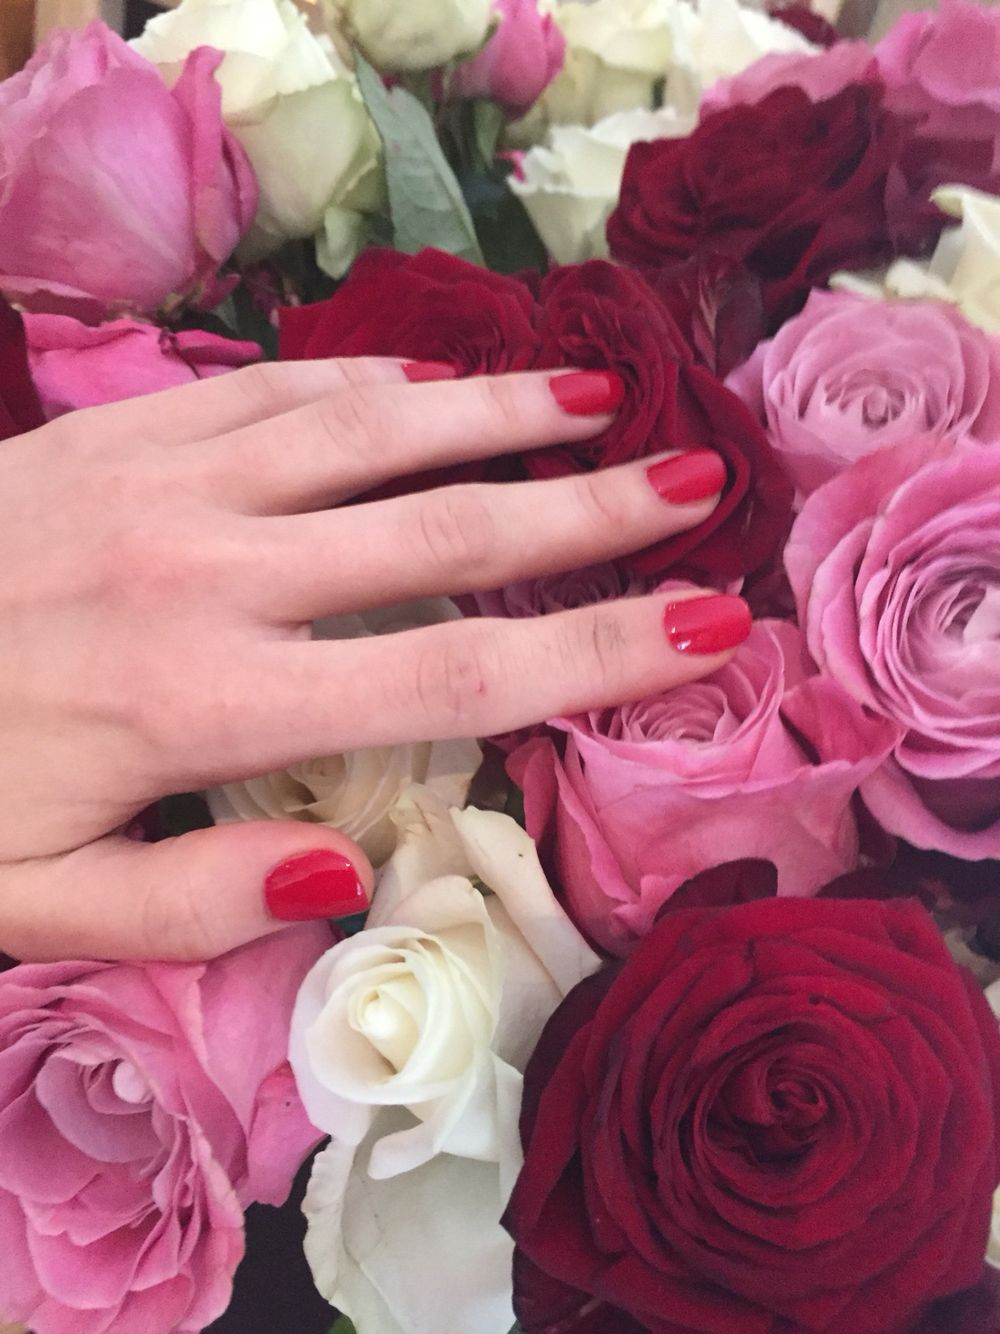 One of the most beautiful bouquet flowers rose rednails manicure one of the most beautiful bouquet flowers rose rednails manicure manipedi medicalpedicure akraboutique knightsbridge jennypackham diamond jewelry izmirmasajfo